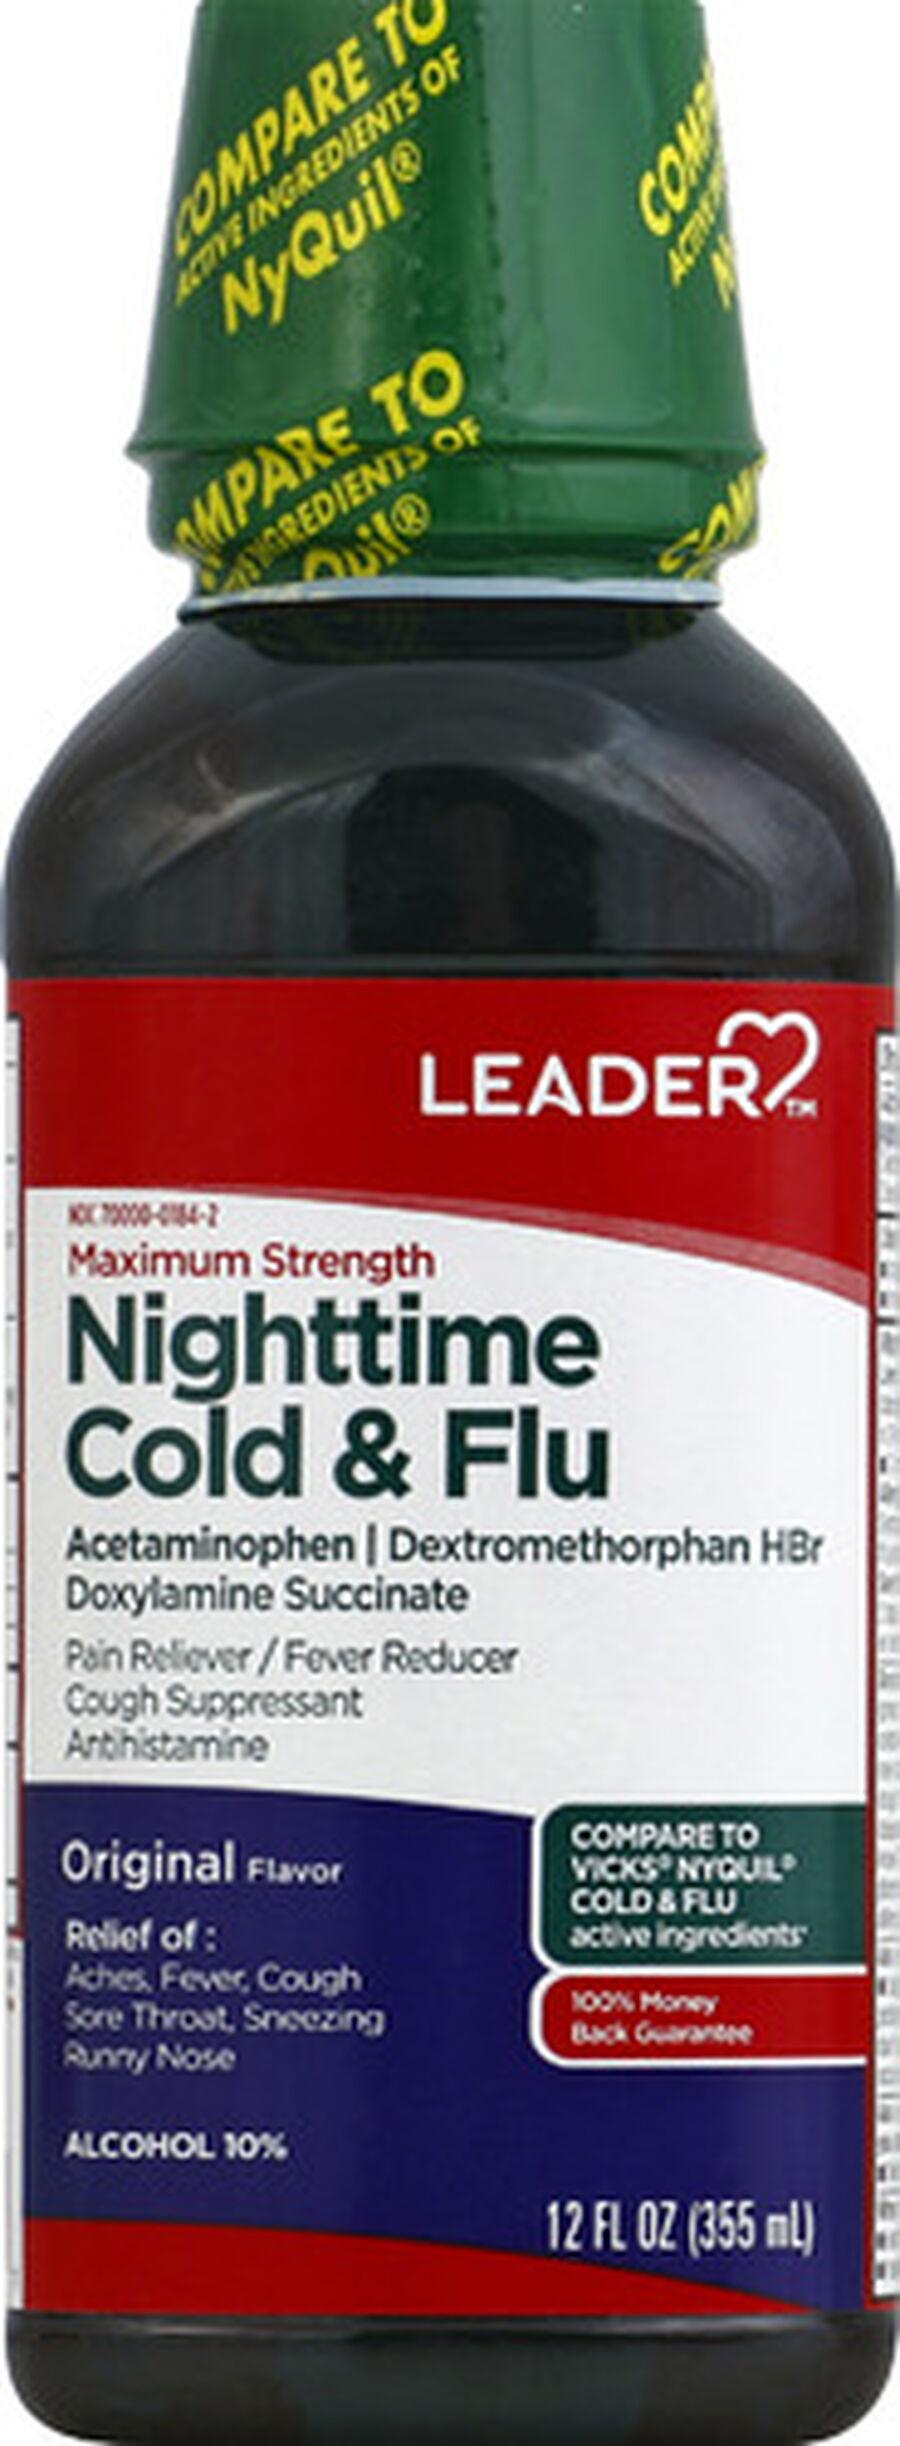 LEADER™ Cold & Flu Nighttime Maximum Strength Liquid 12 oz, , large image number 0